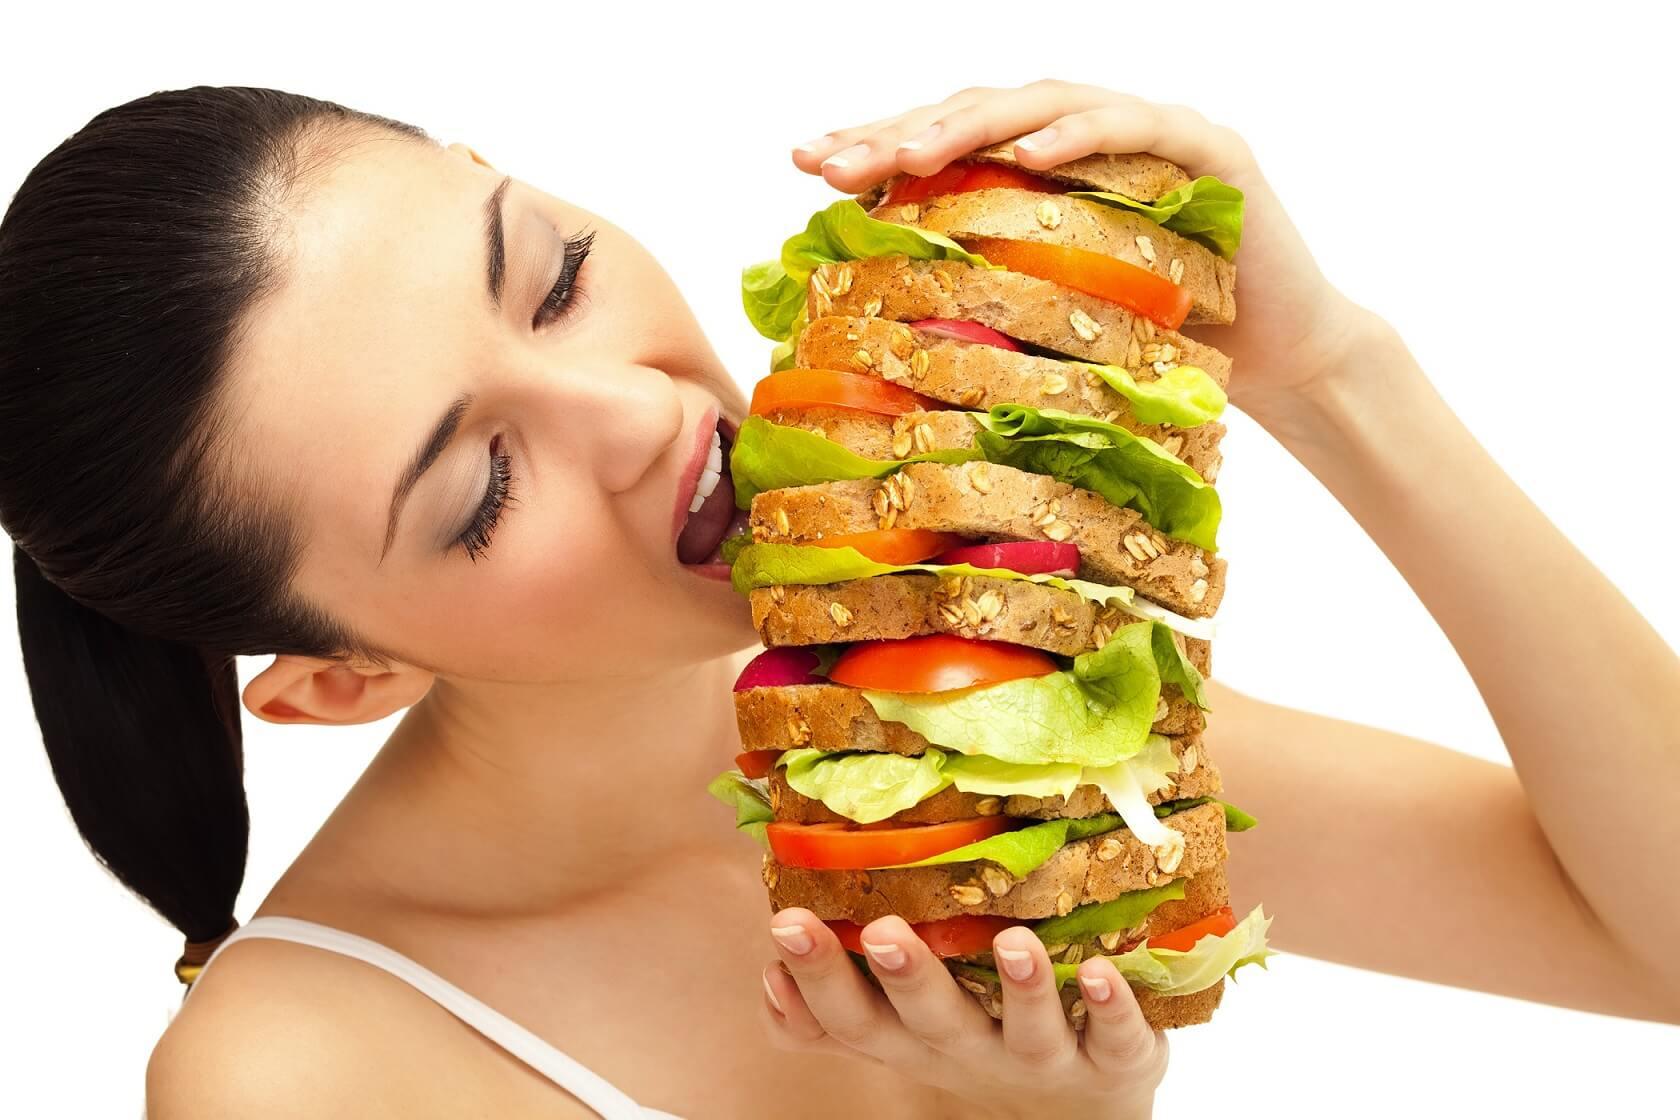 Appetite-kafetzopoulos  Έξι λόγοι για τους οποίους πεινάς ενώ έχεις ήδη φάει Appetite kafetzopoulos